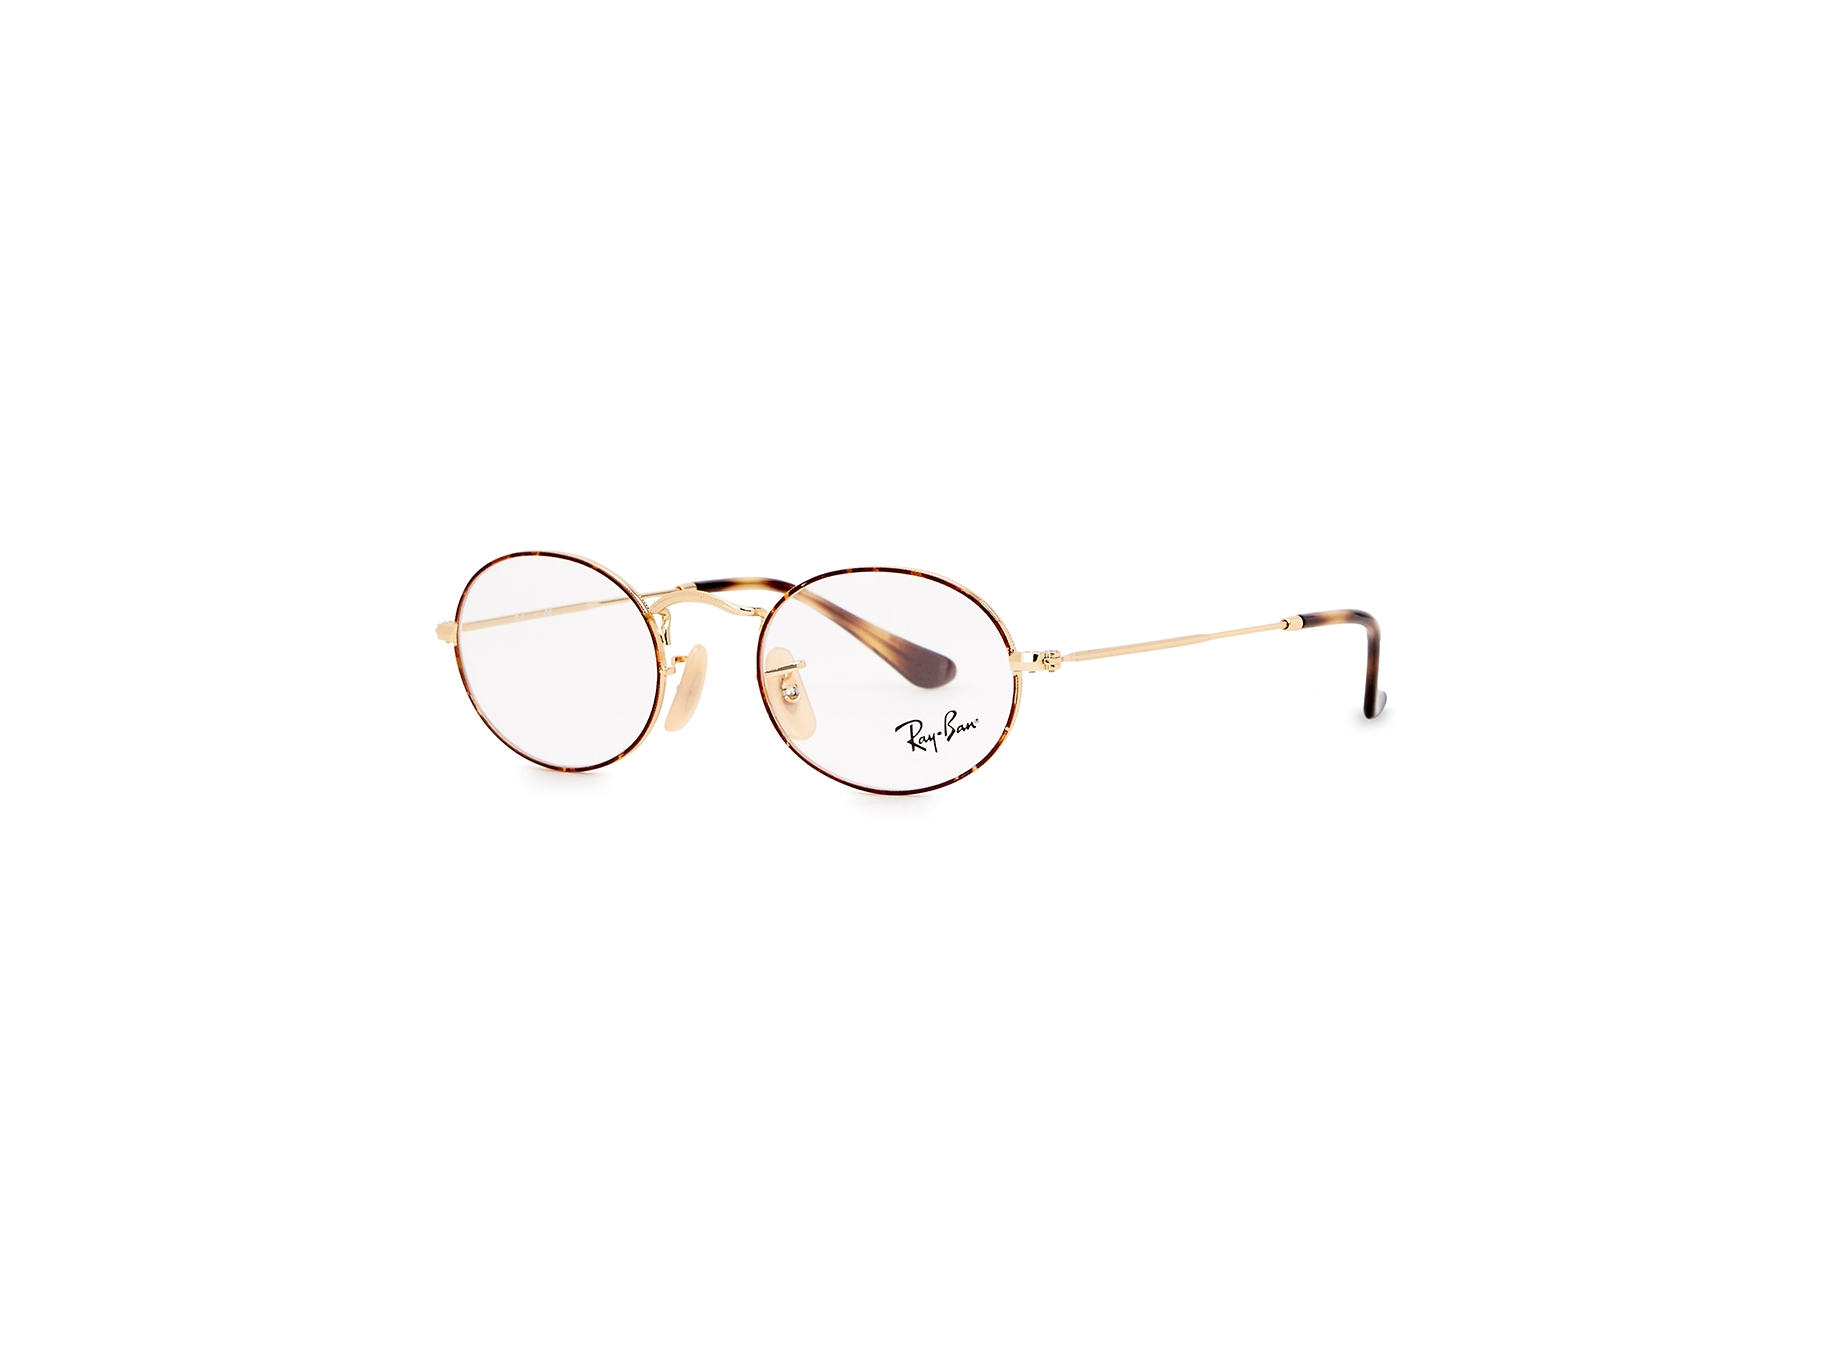 84a1656456 Ray-Ban Gold-tone oval-frame optical glasses - Harvey Nichols